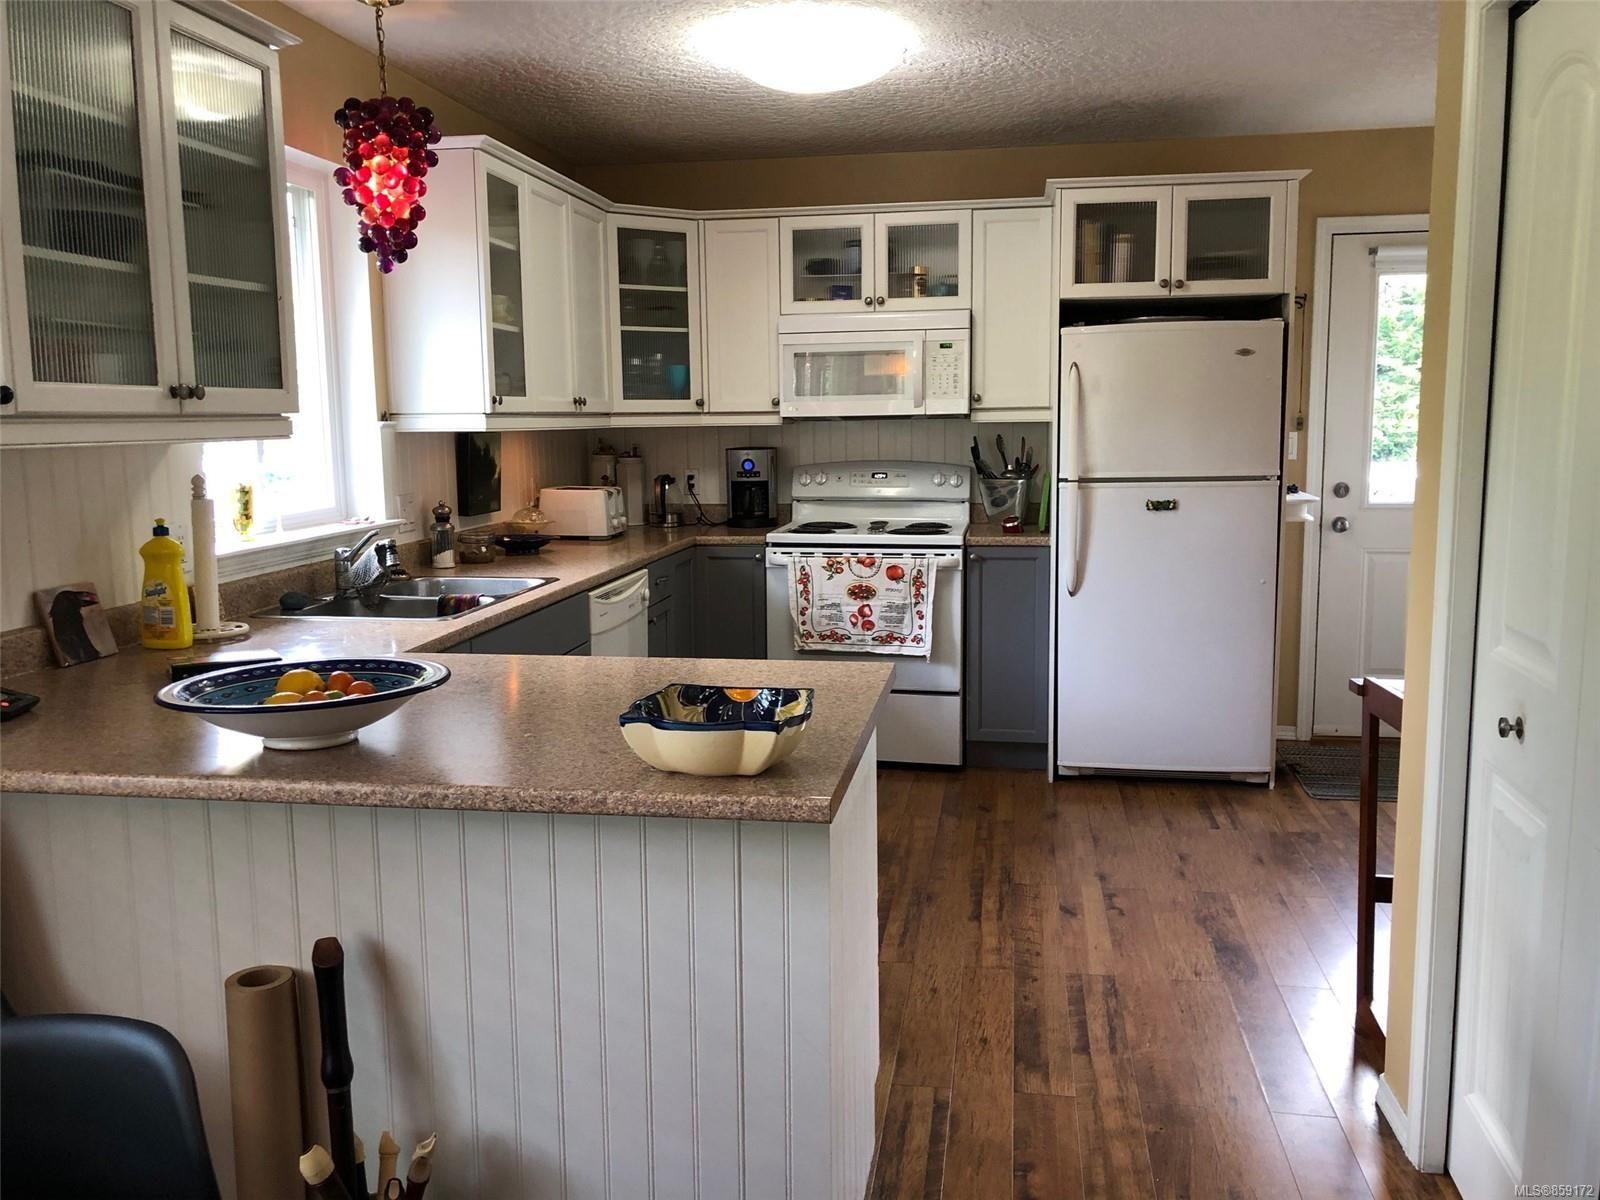 Photo 2: Photos: 1723 Karen's Crt in : PQ Qualicum North House for sale (Parksville/Qualicum)  : MLS®# 859172